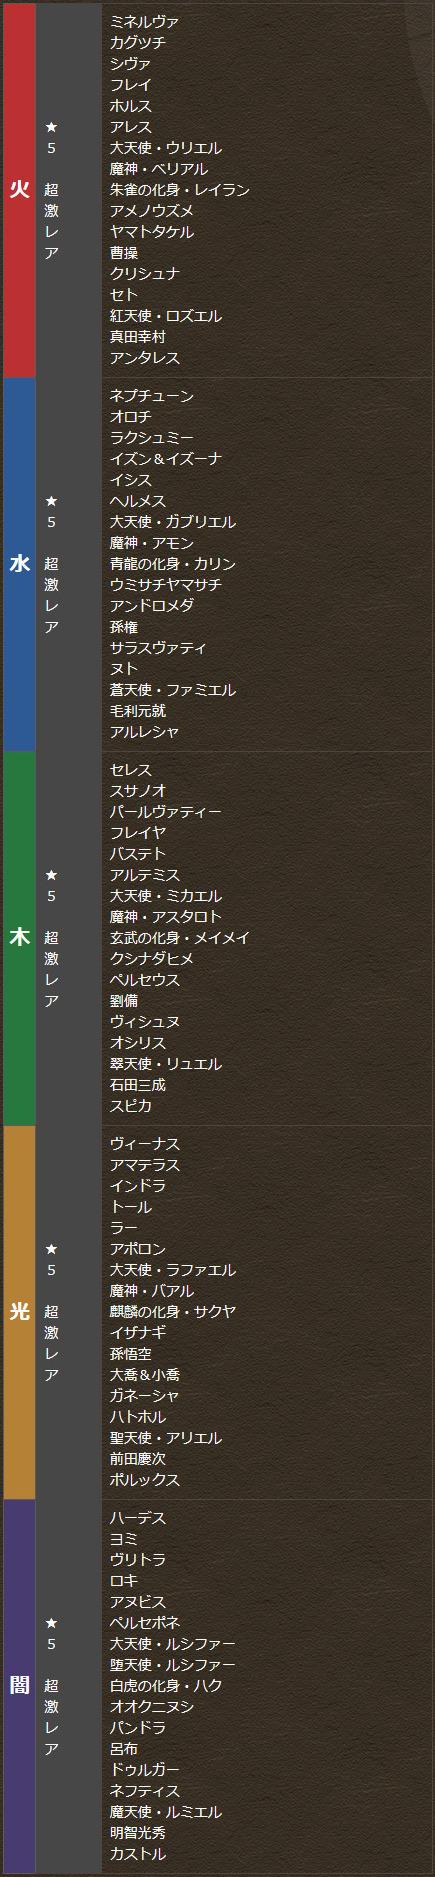 g_20160126152940689.jpg